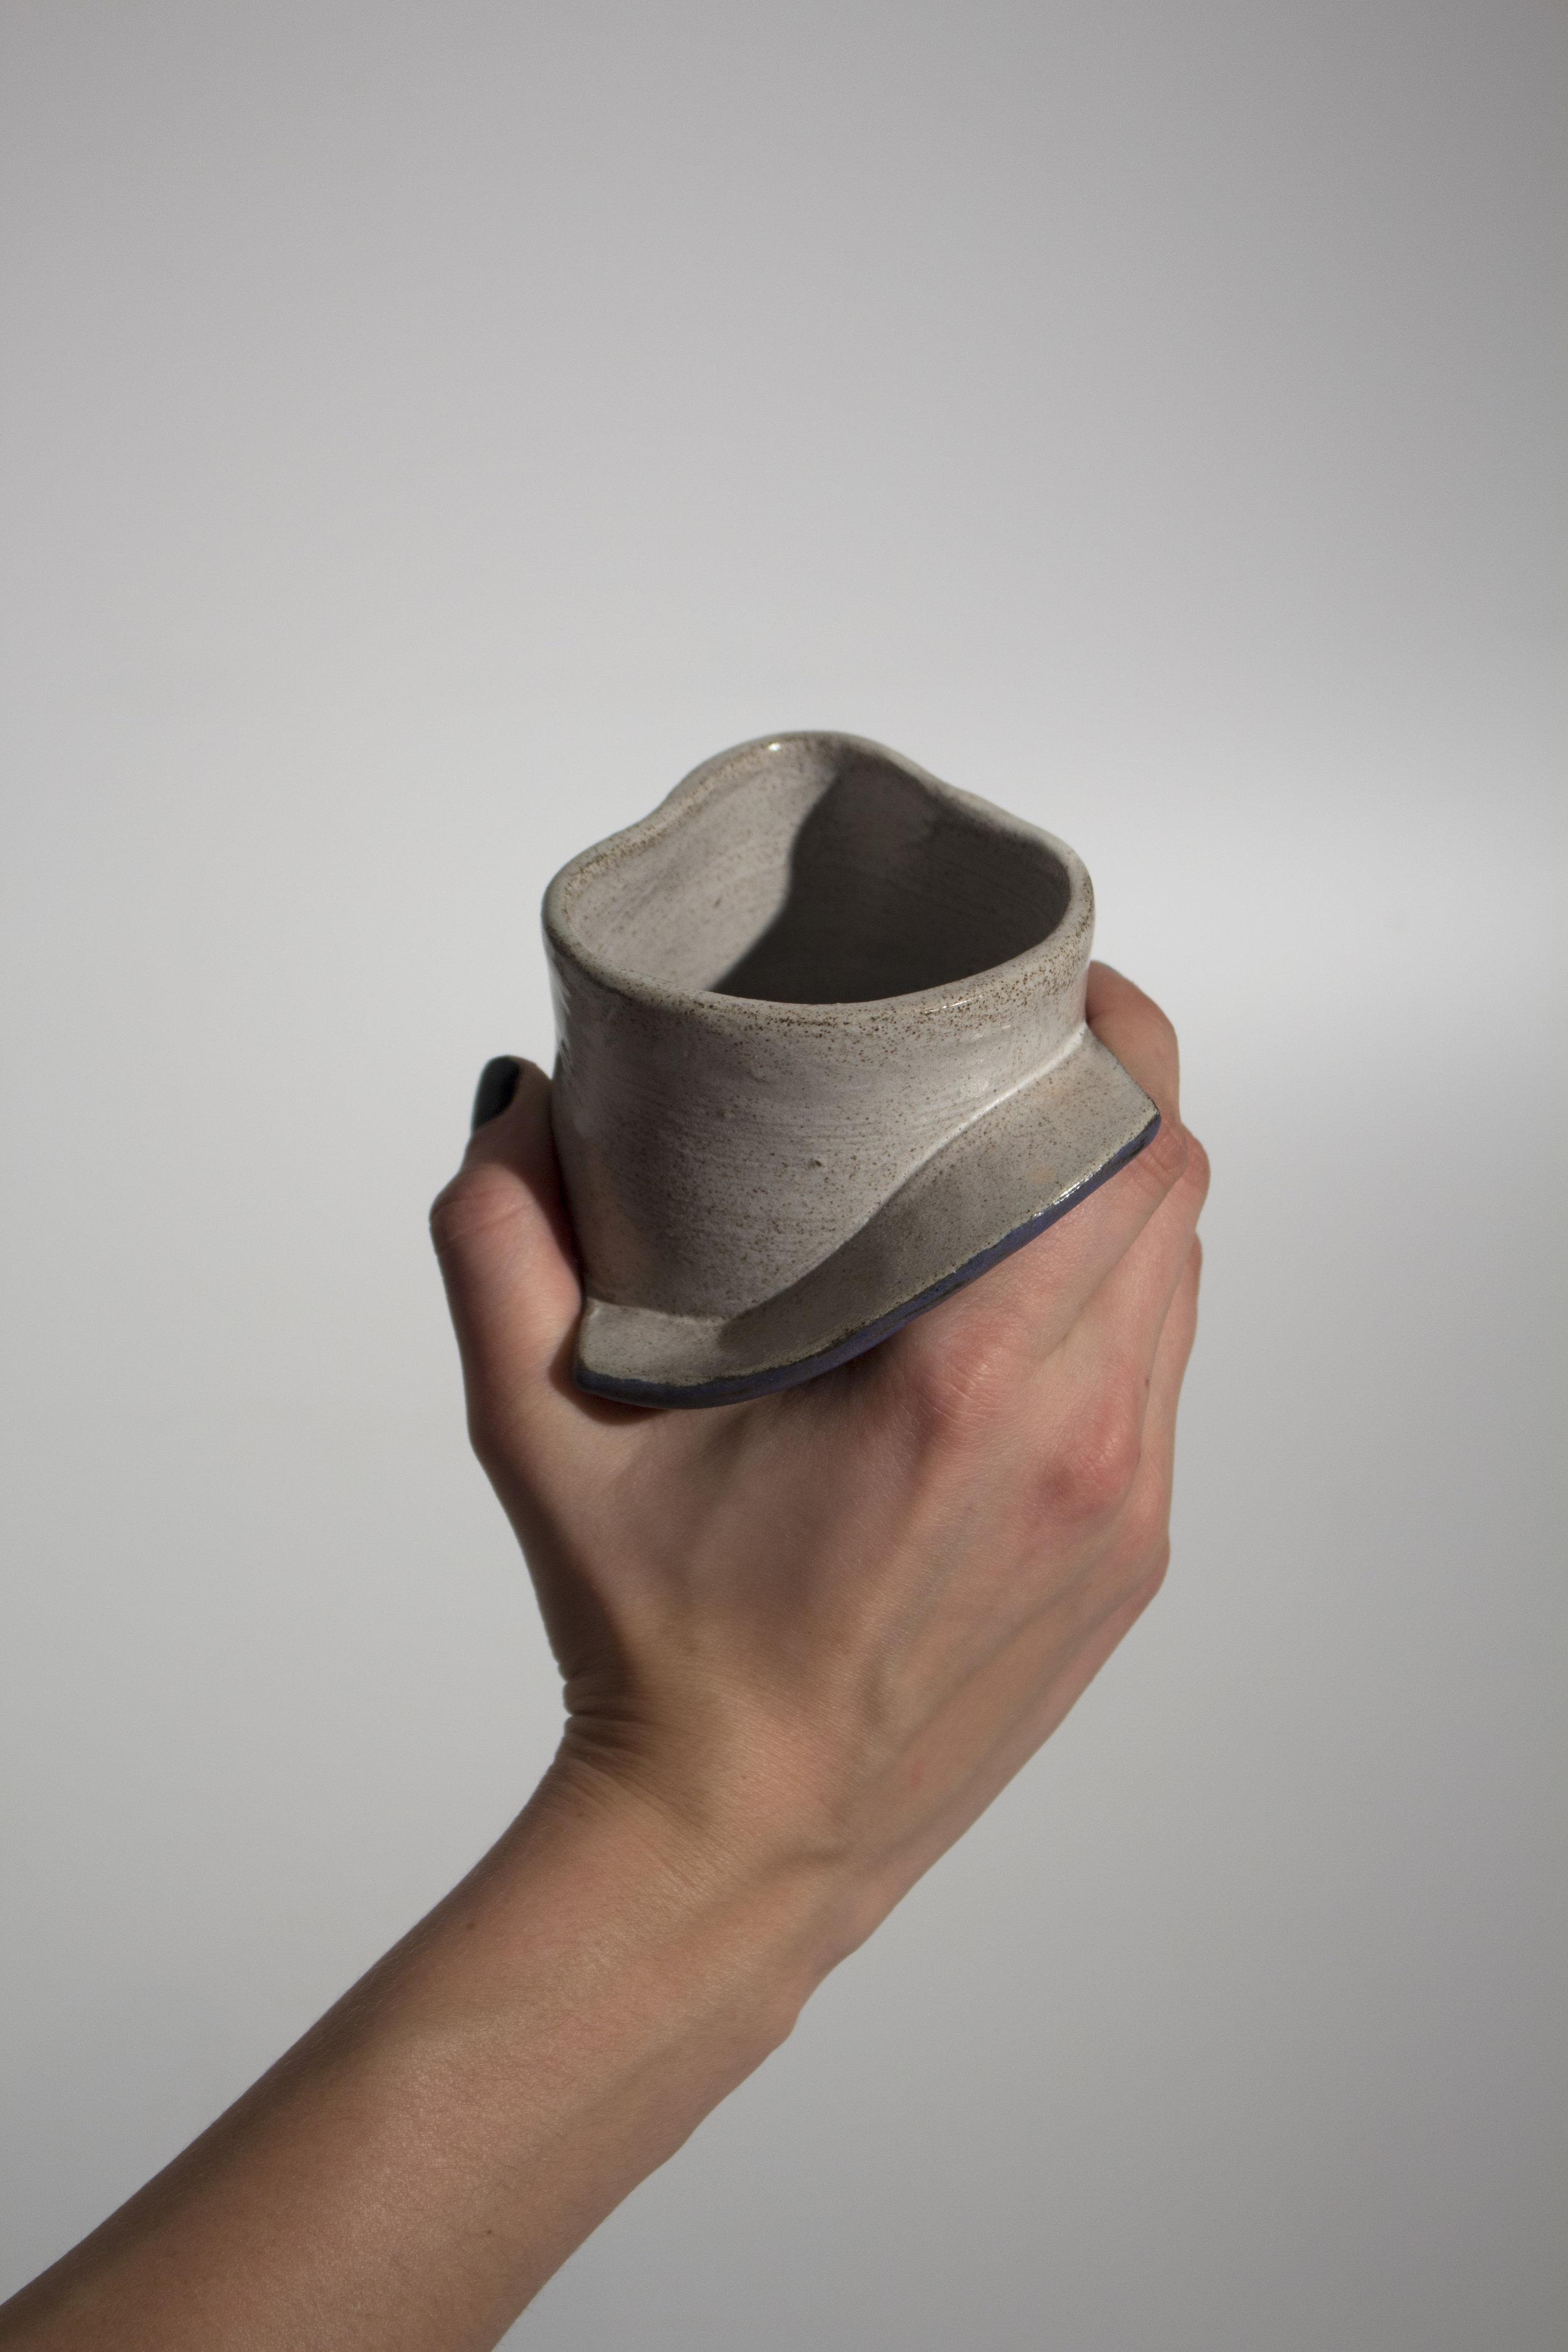 Majenta_ Strongheart_Ceramics Detail 3